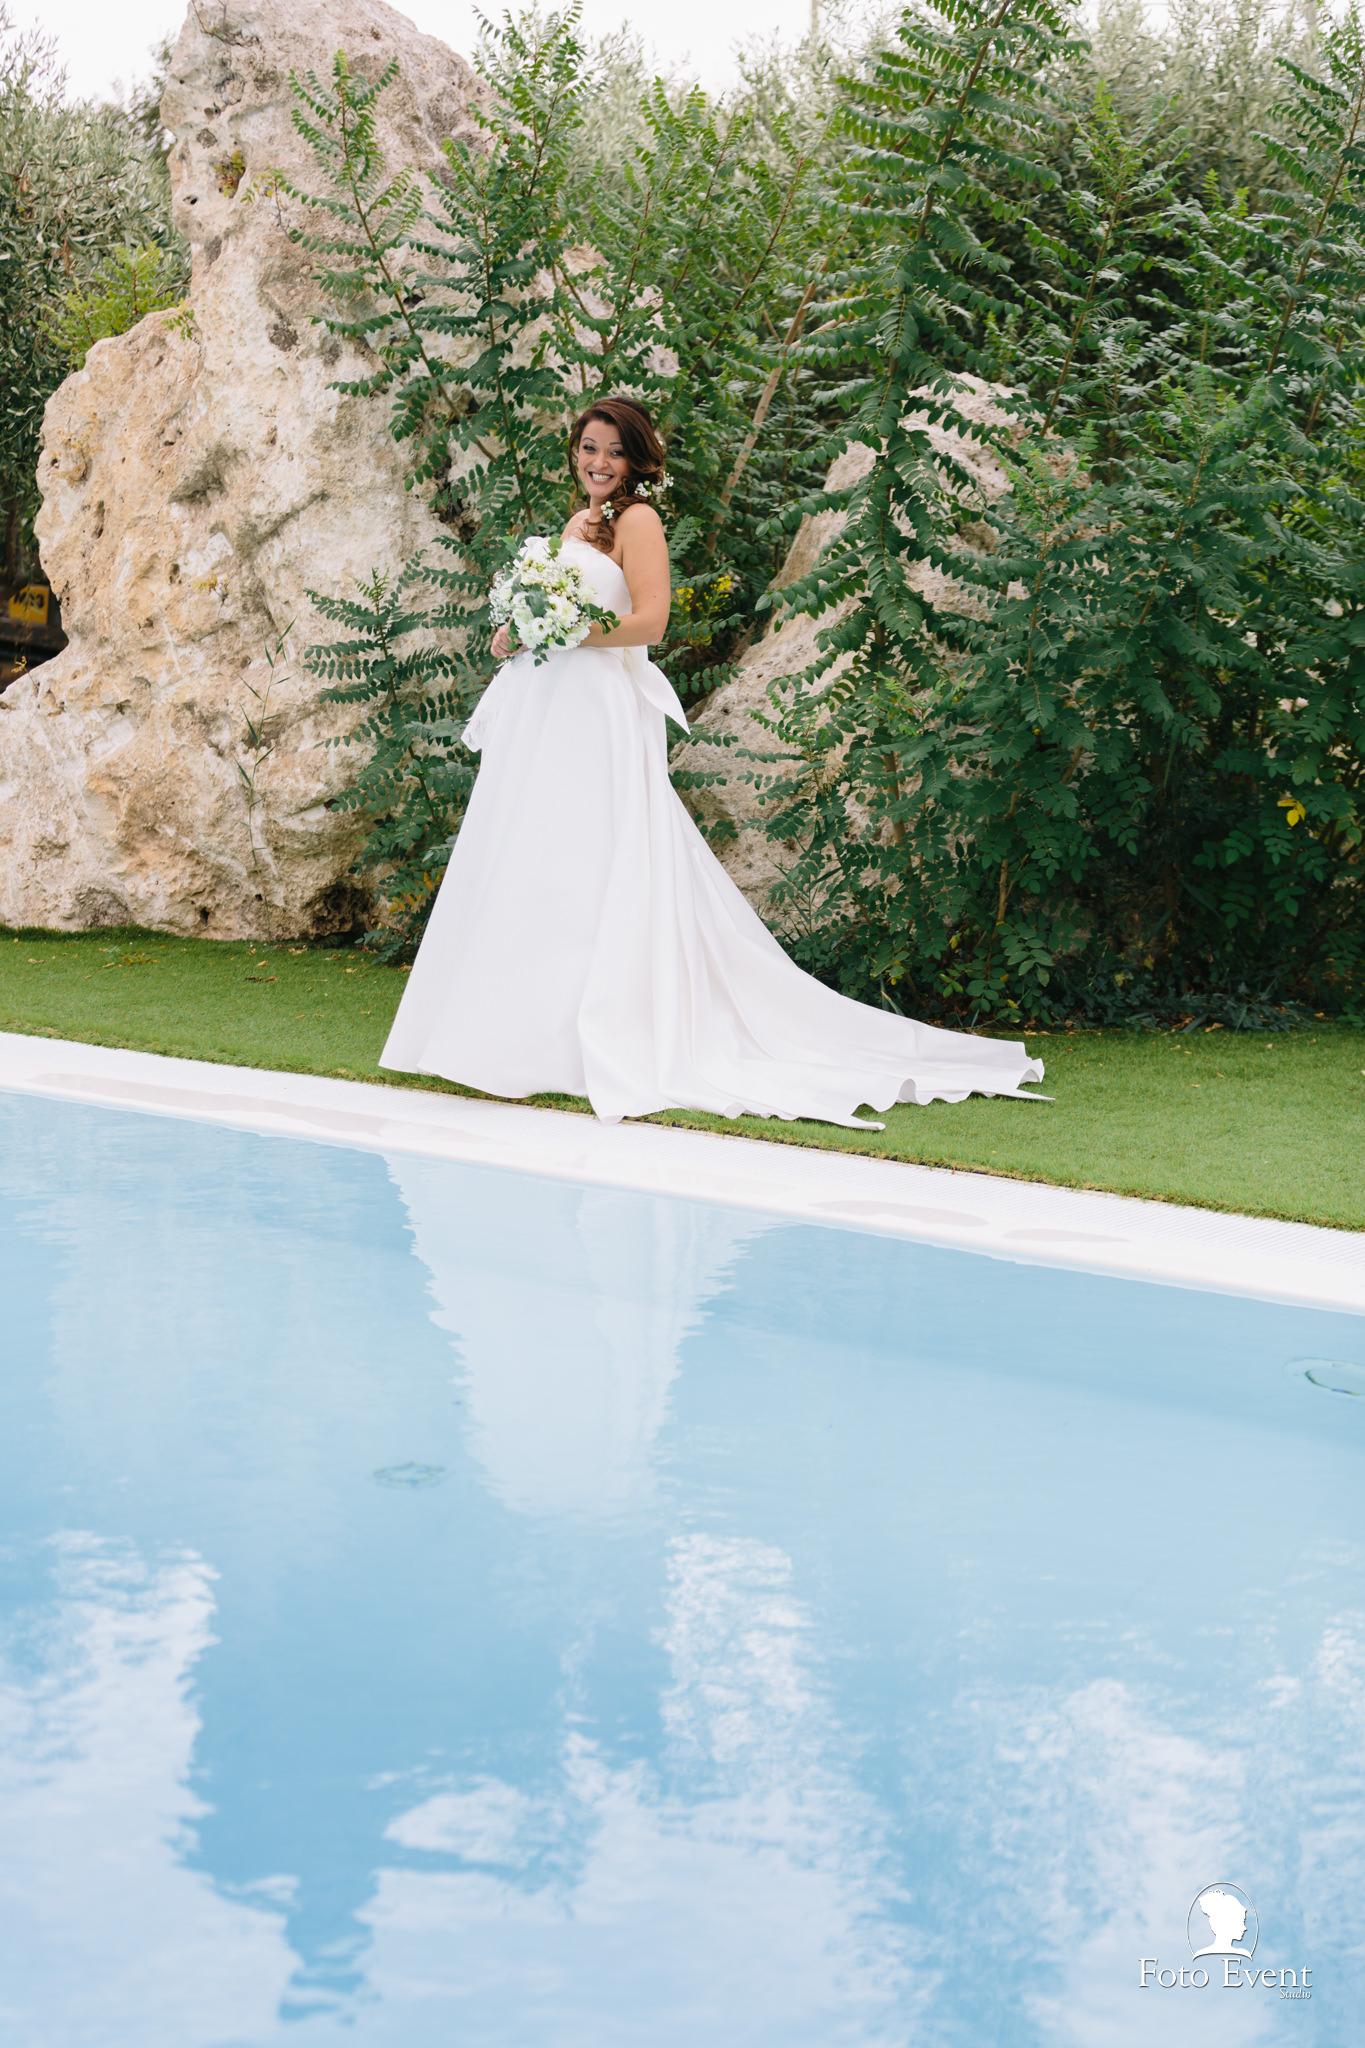 025-2020-10-15-Matrimonio-Noemi-e-Salvatore-Paterno-zoom-279